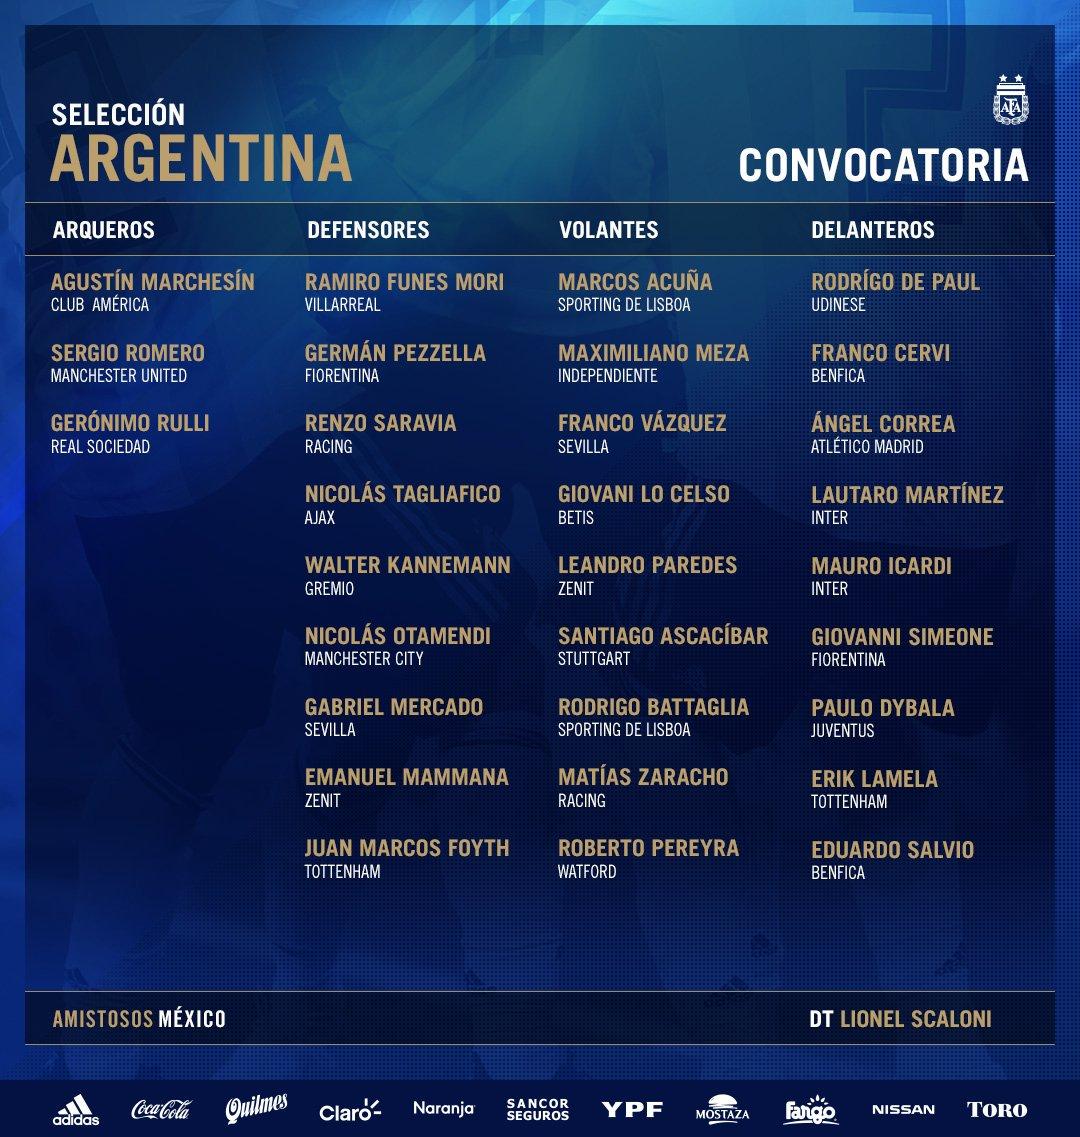 La convocatoria de Argentina para enfrentar a México